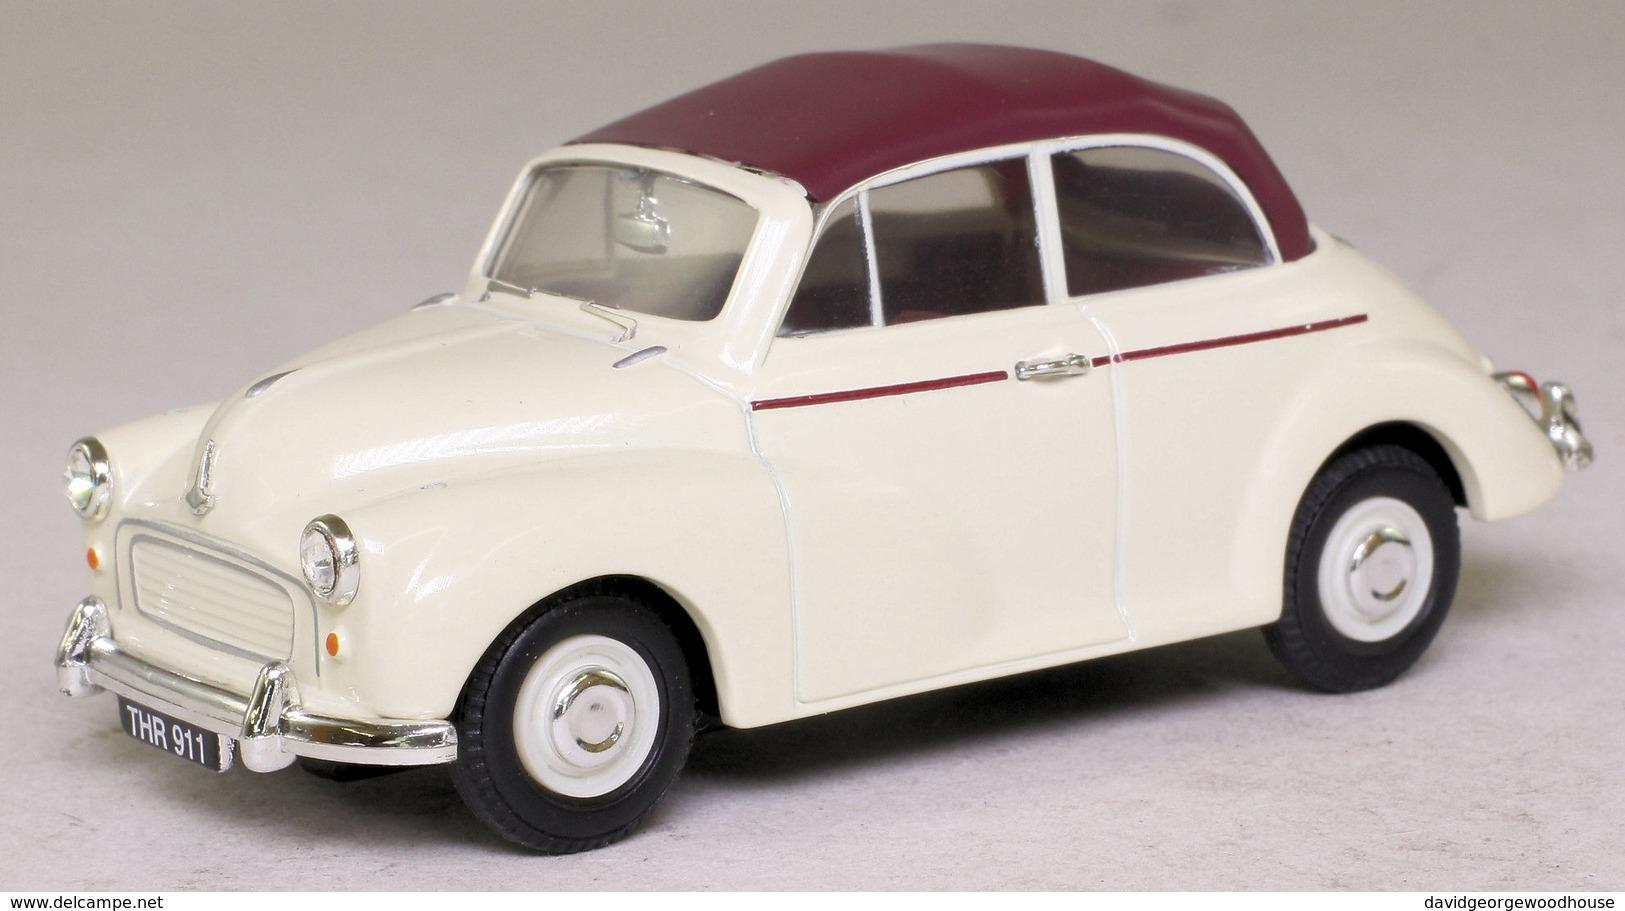 Morris Minor Convertible: Cream & Maroon. - Cars & 4-wheels